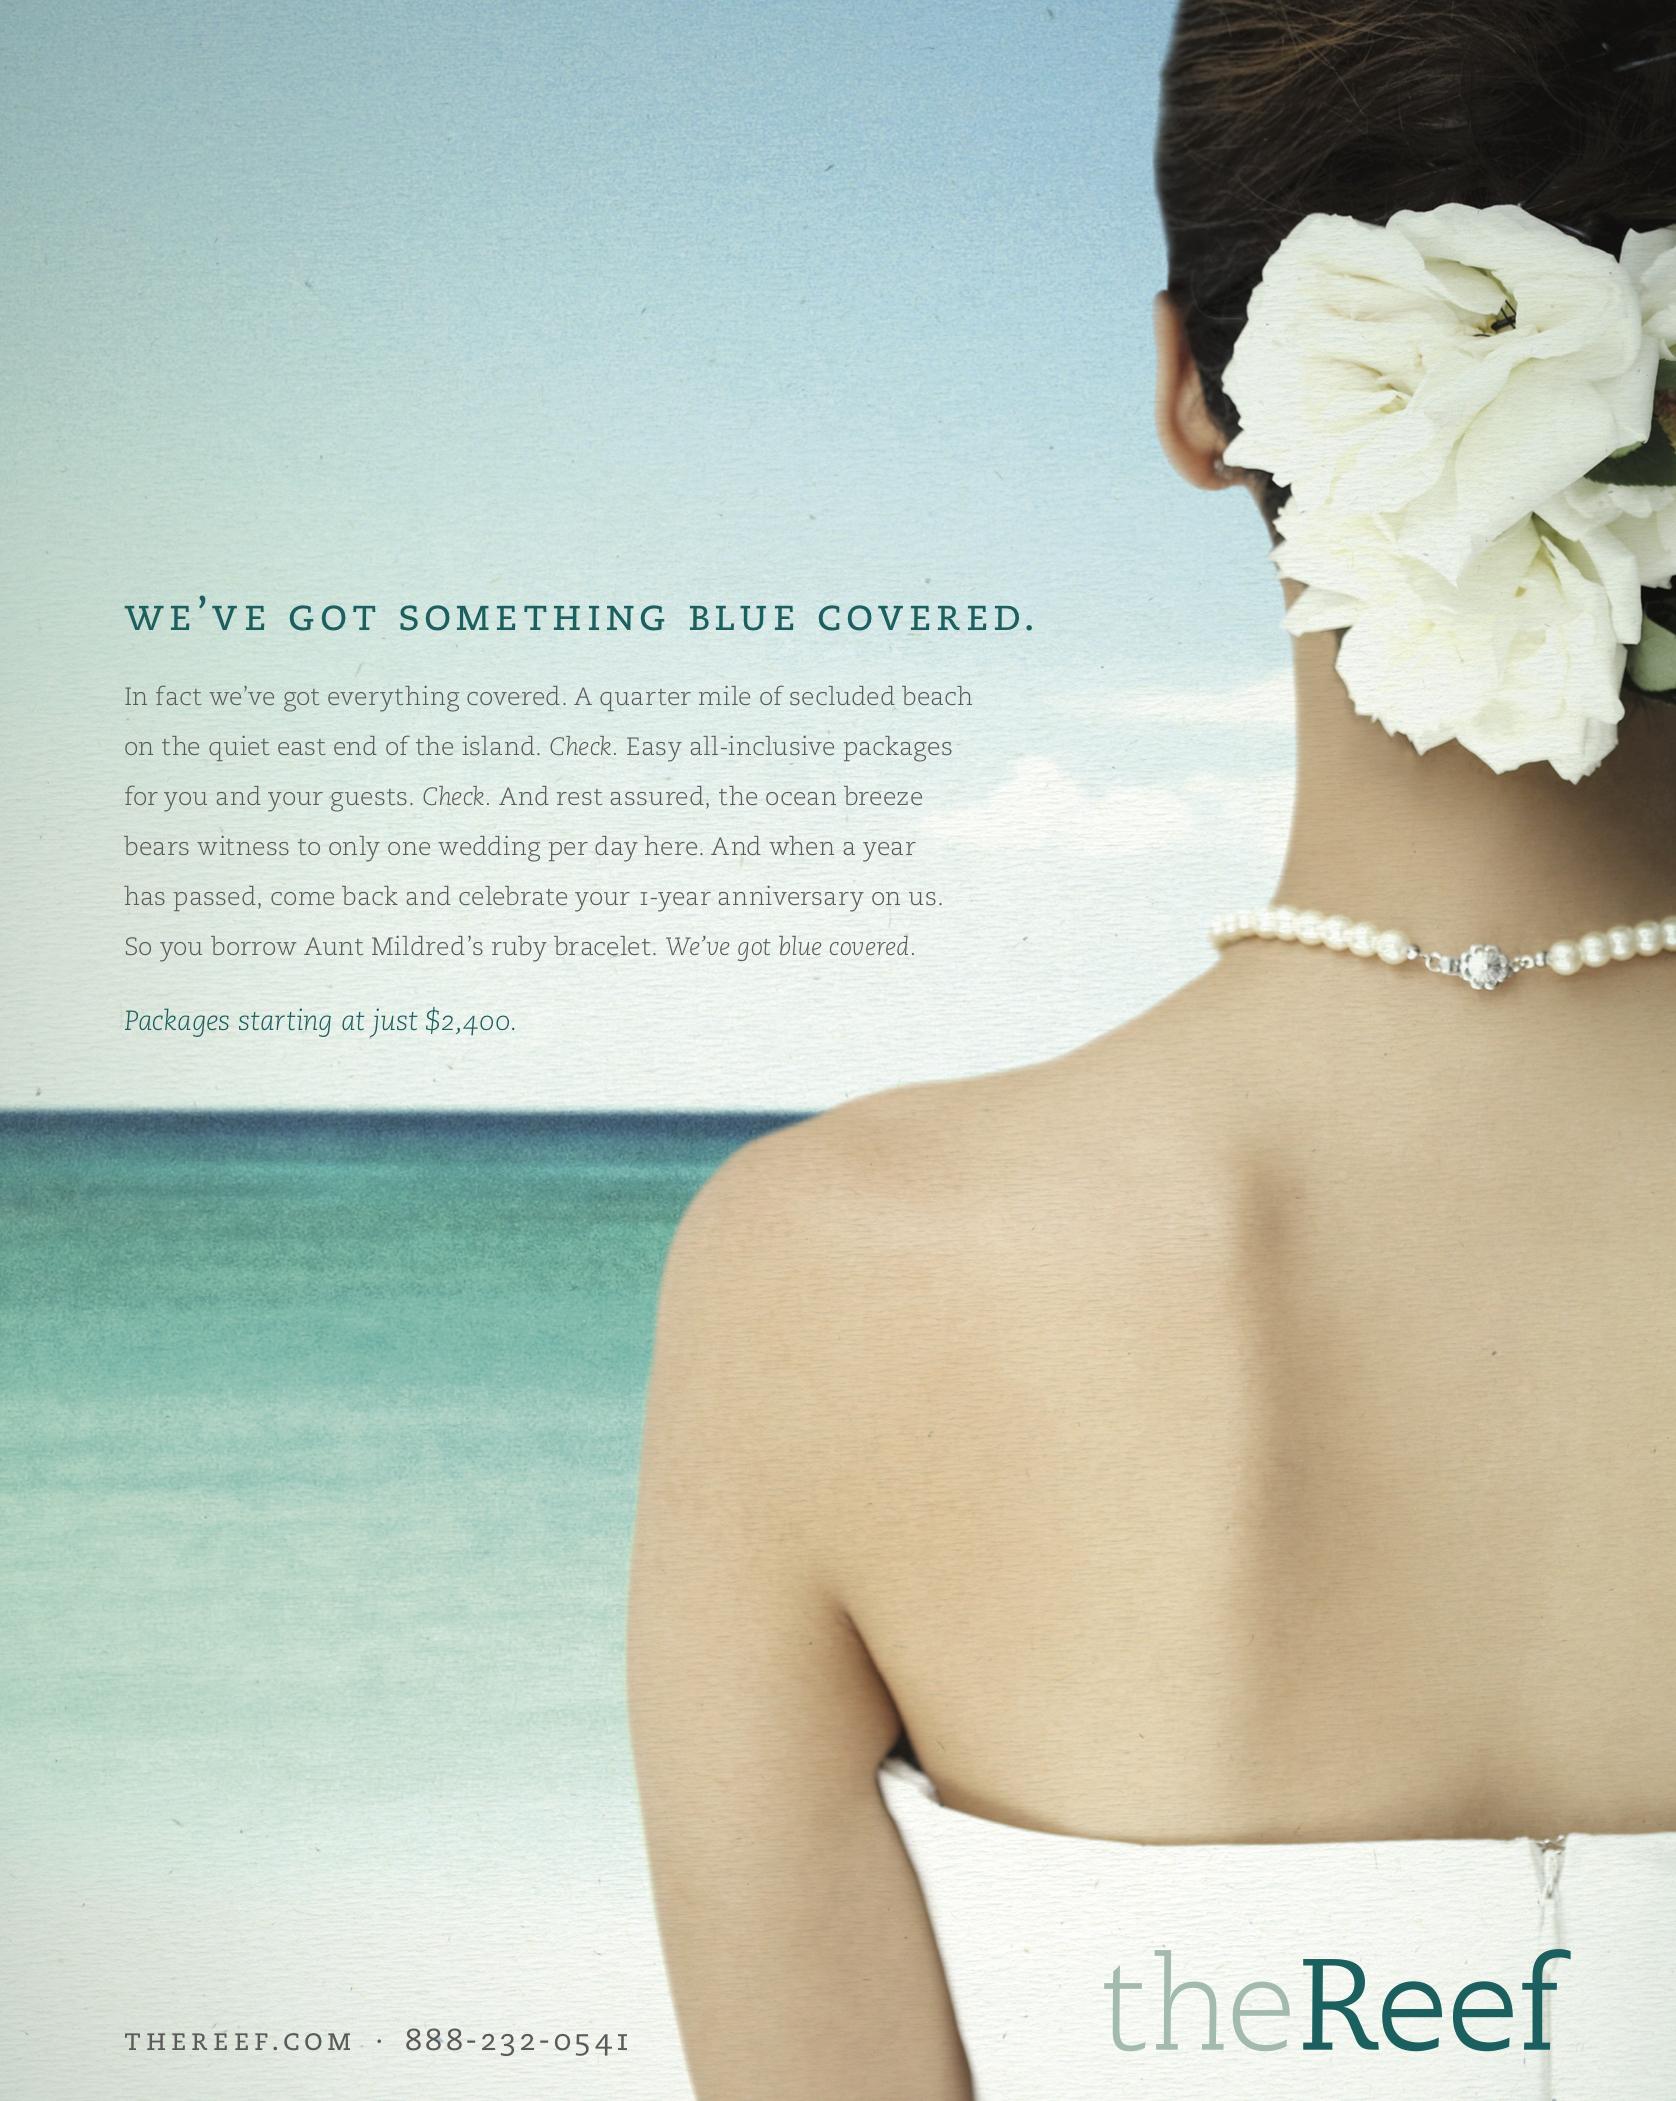 theReef_Wedding.jpg